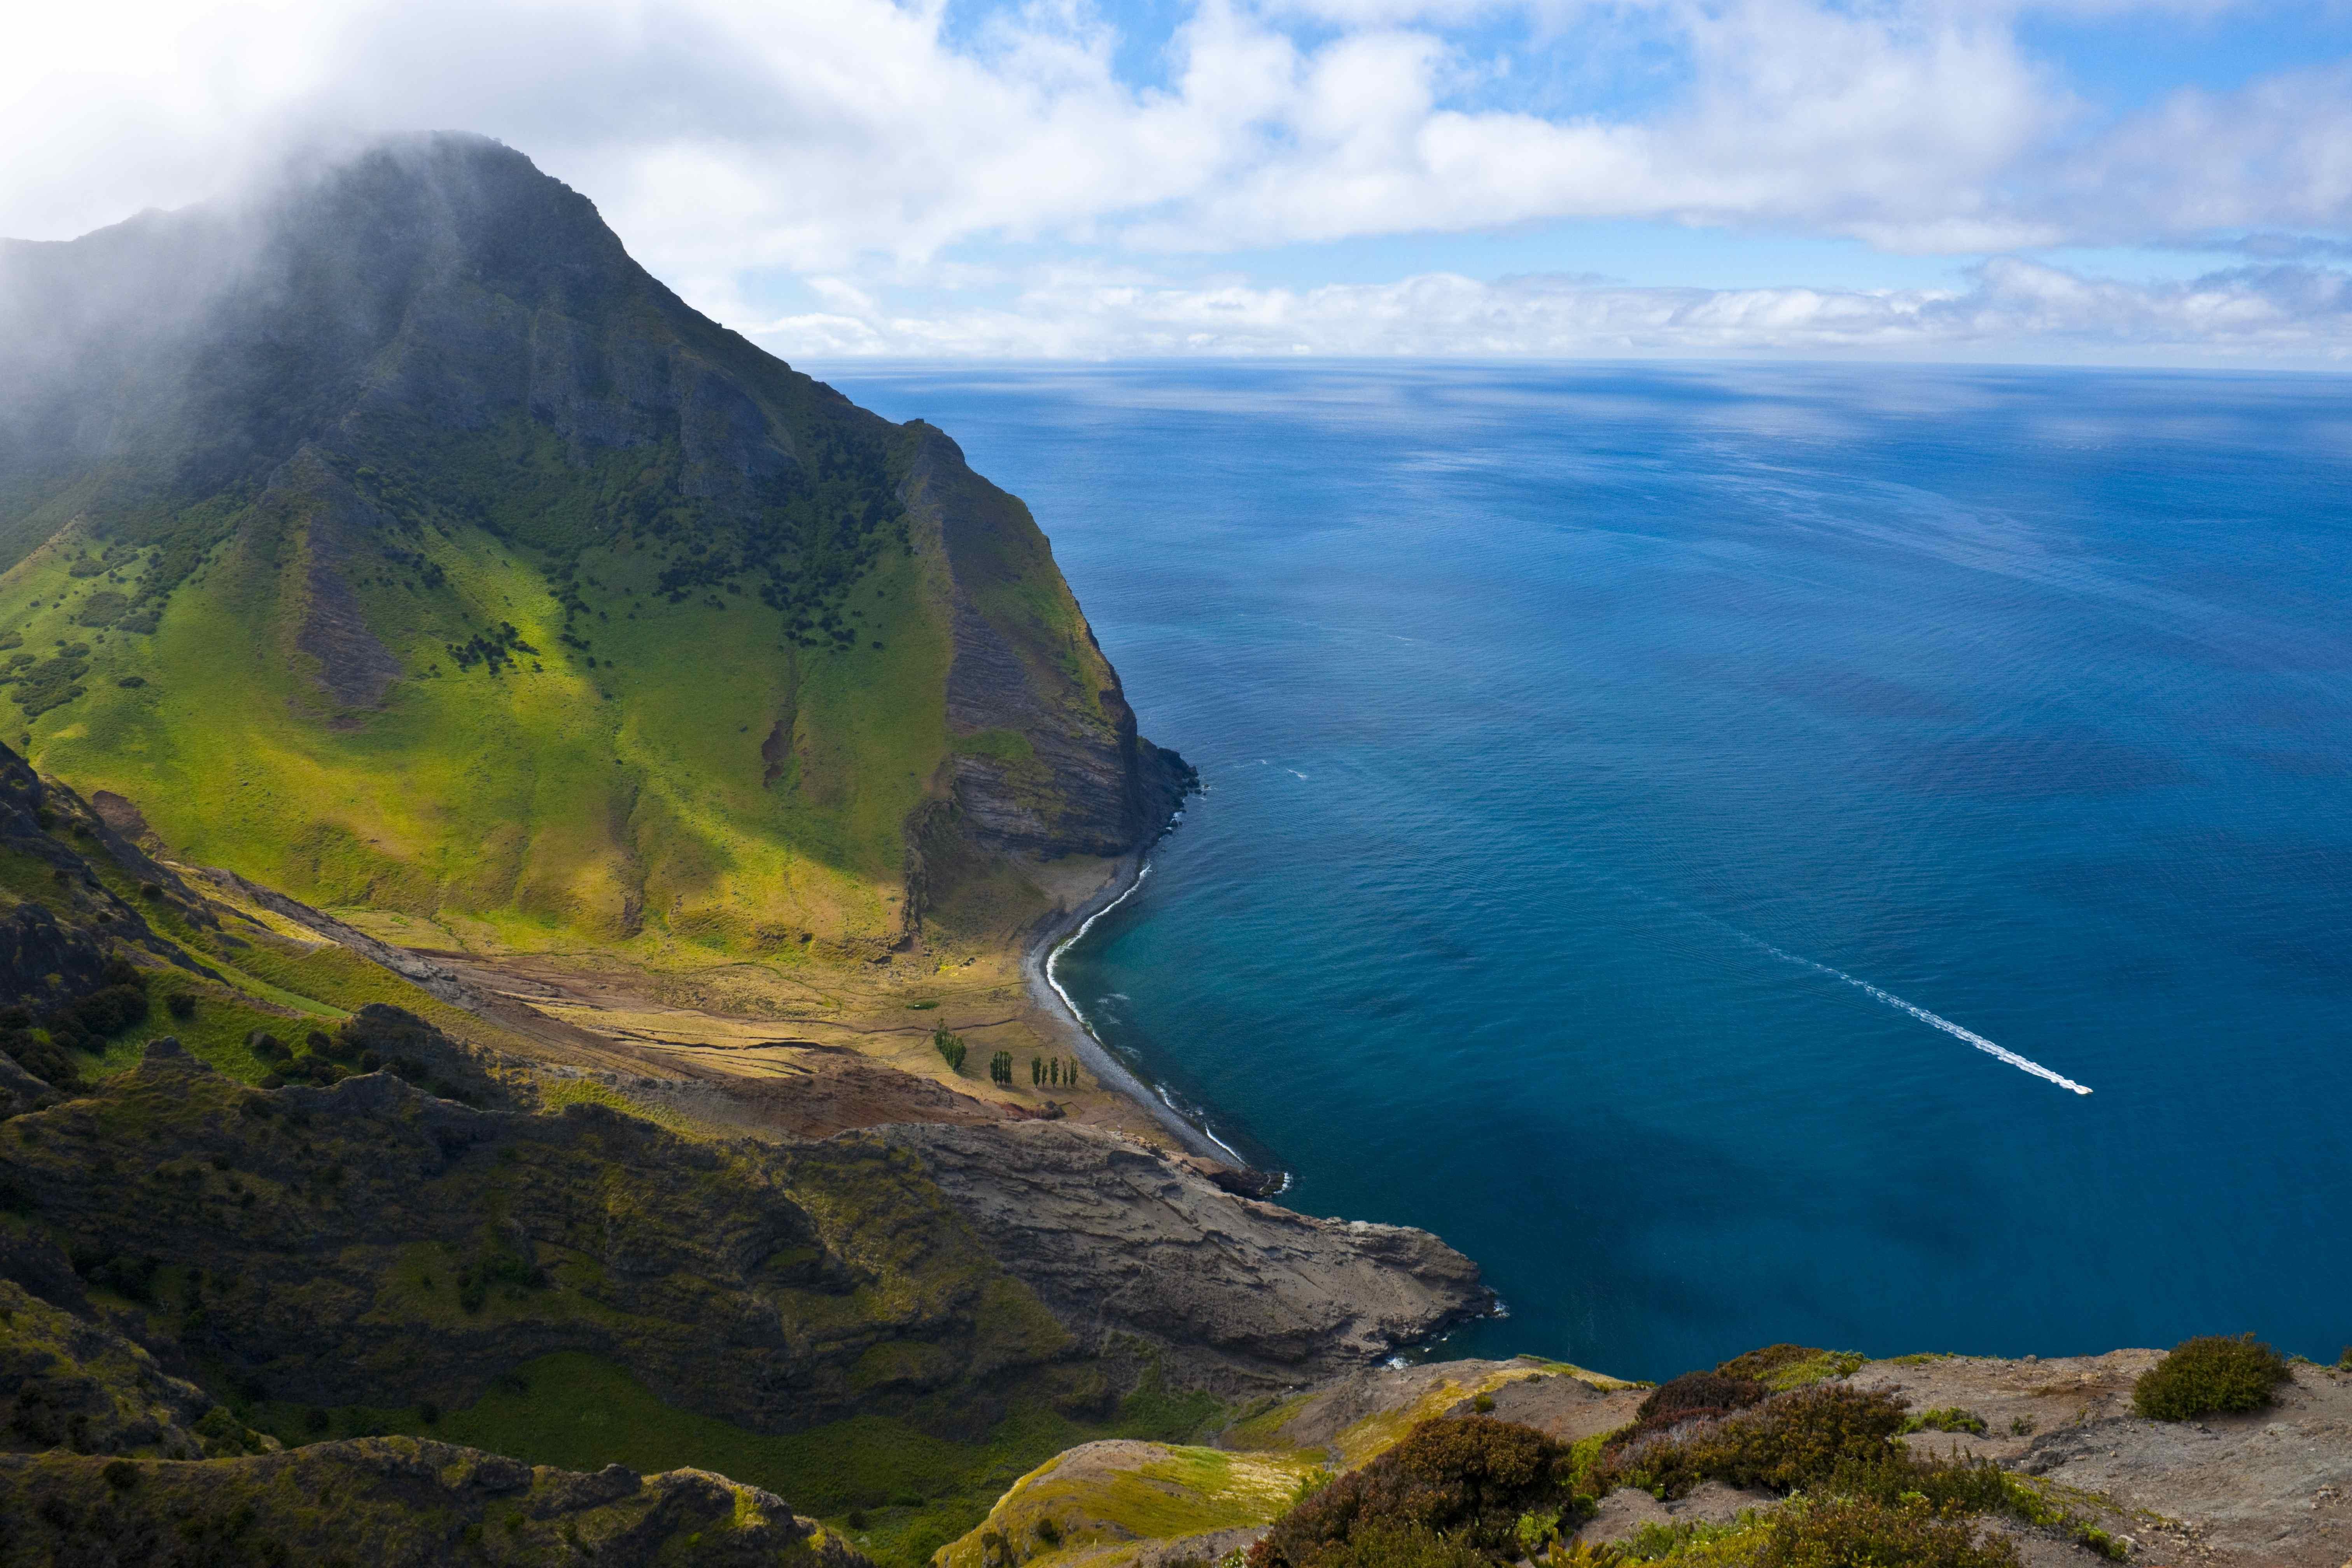 4.Robinson Crusoe Island